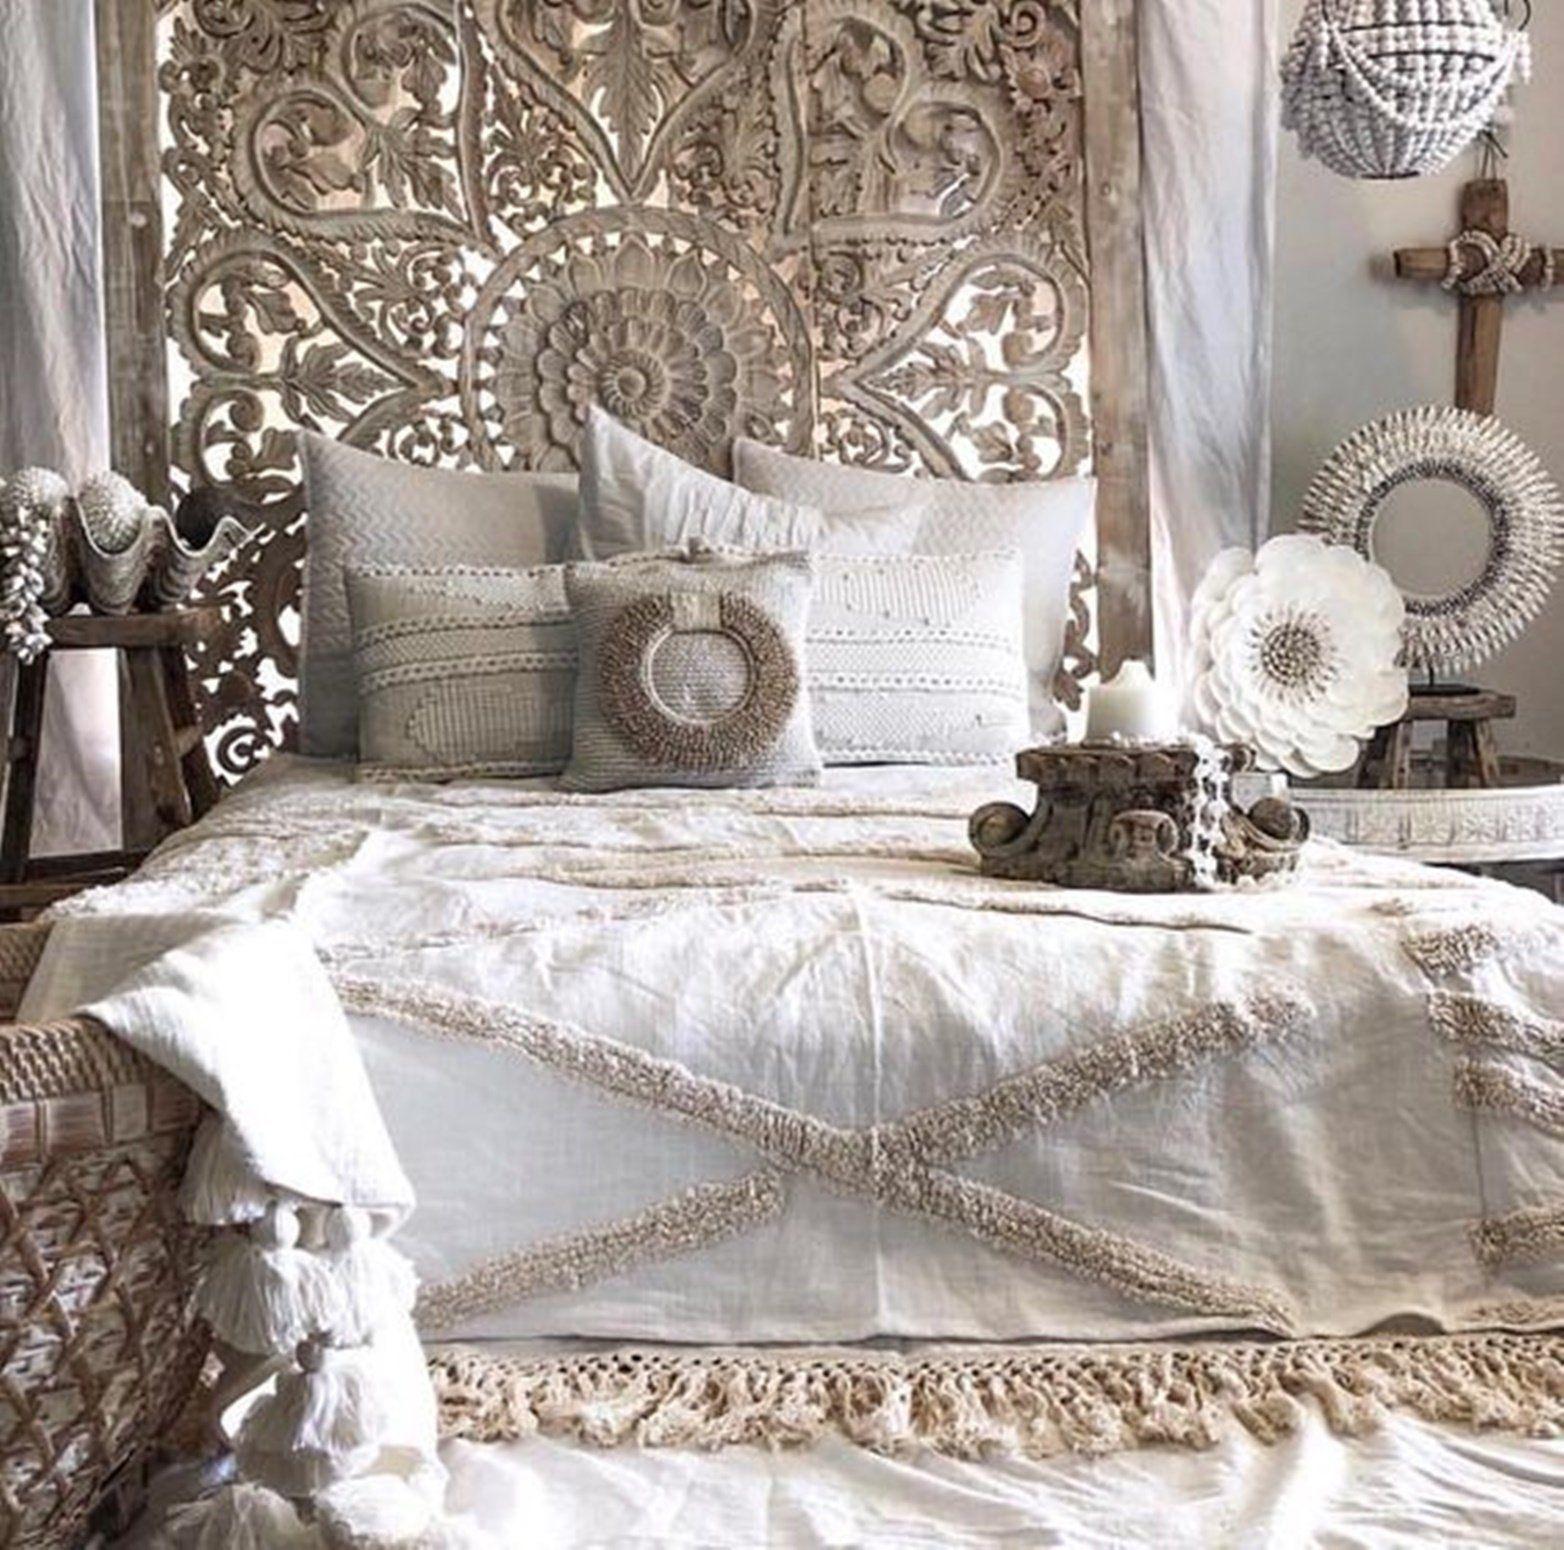 71 Large Wall Art King Size Bed Sculpture Bohemian Headboard Decorative Flower Mandala Wooden Hand Craved Teak Wood Panel White Bohemian Bedroom Design White Paneling Bedroom Design